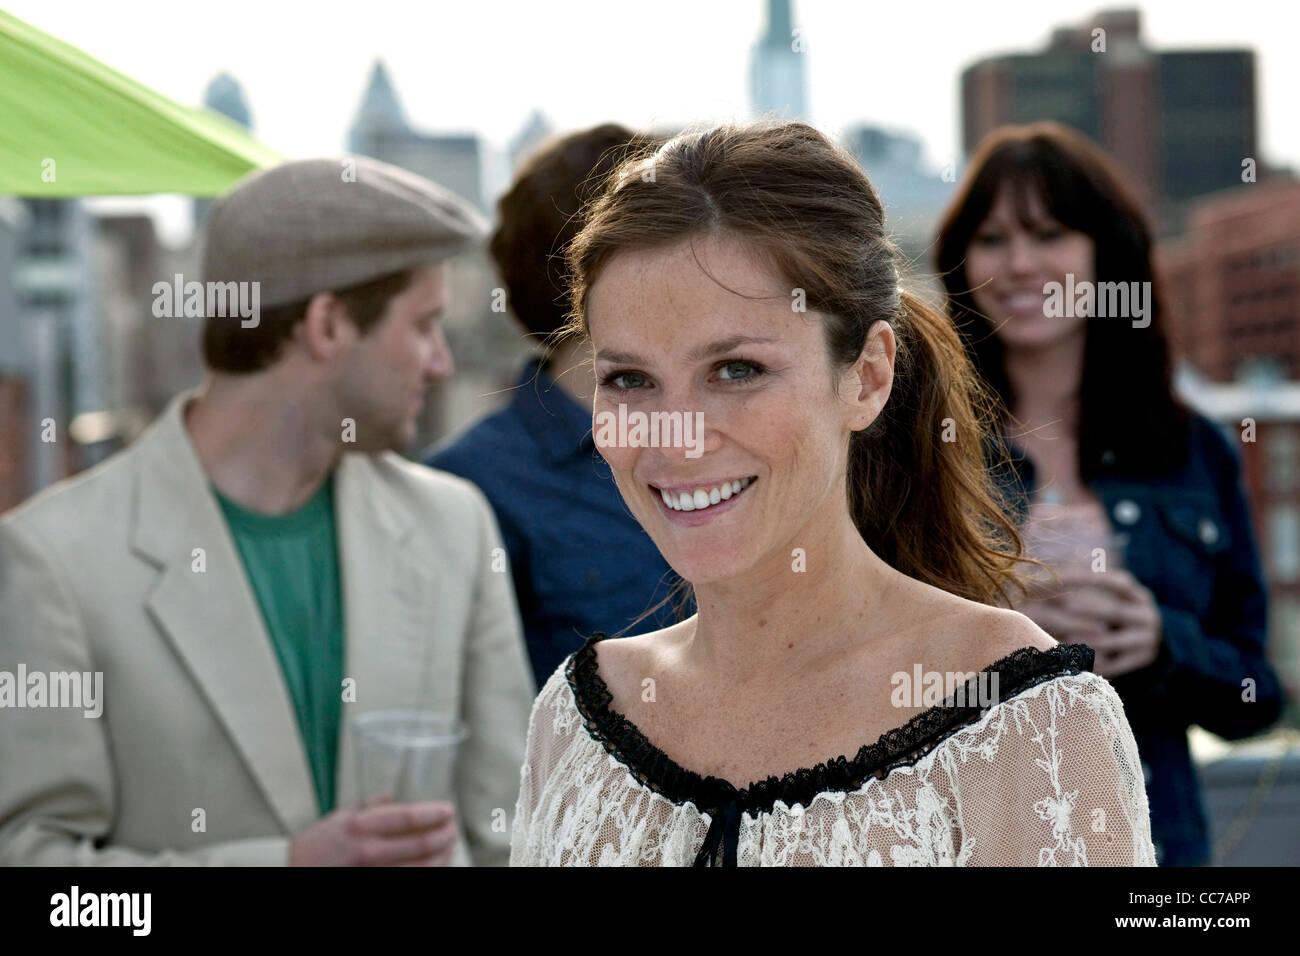 ANNA FRIEL LIMITLESS (2011) - Stock Image